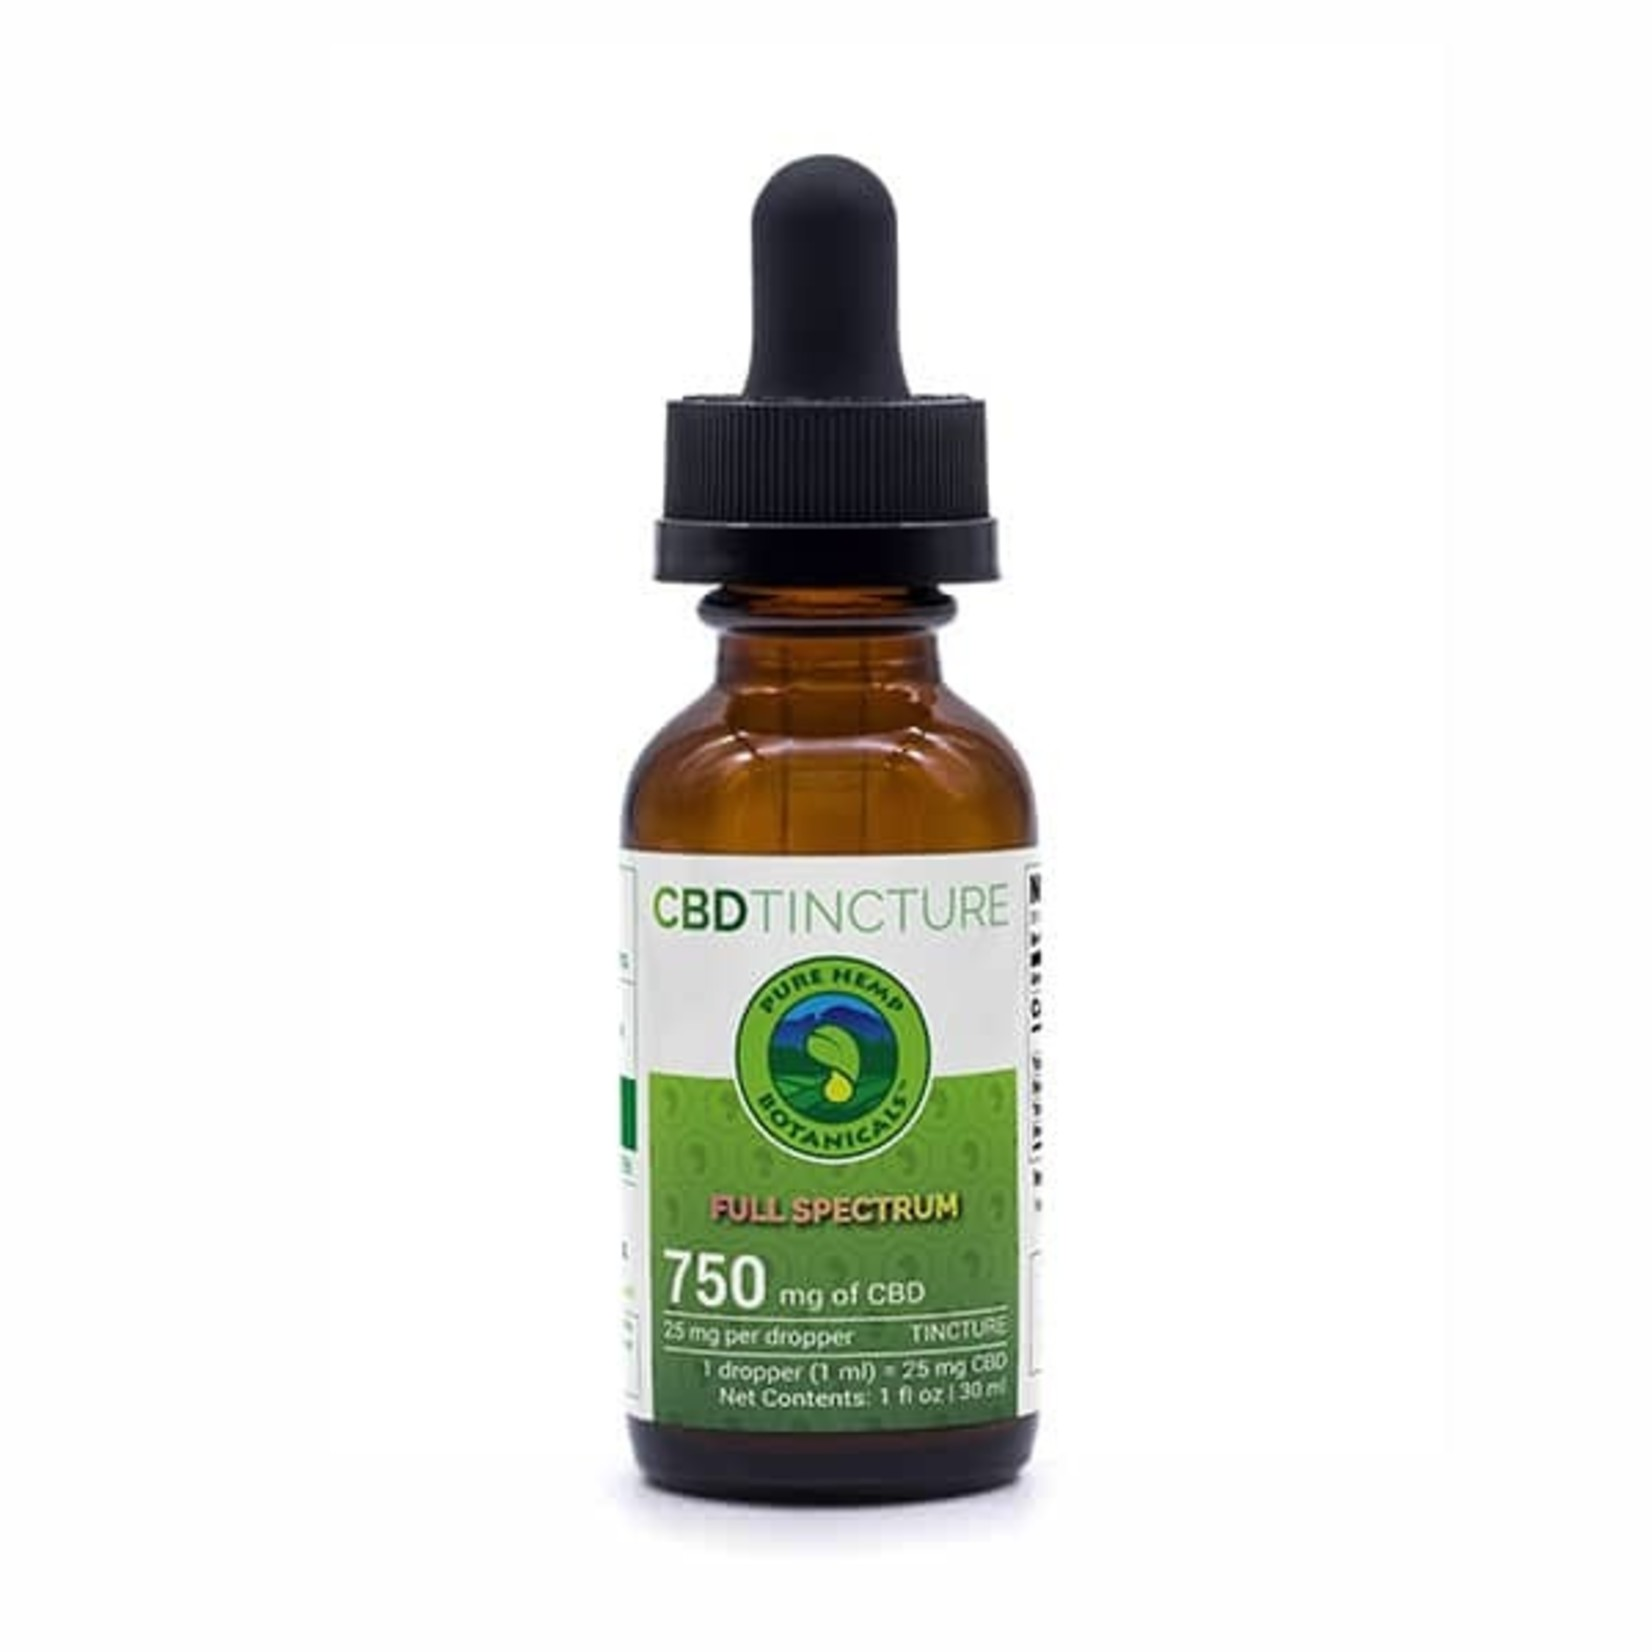 Pure Hemp Botanicals PHB Full Spectrum CBD Tincture Oil 750mg 30ml